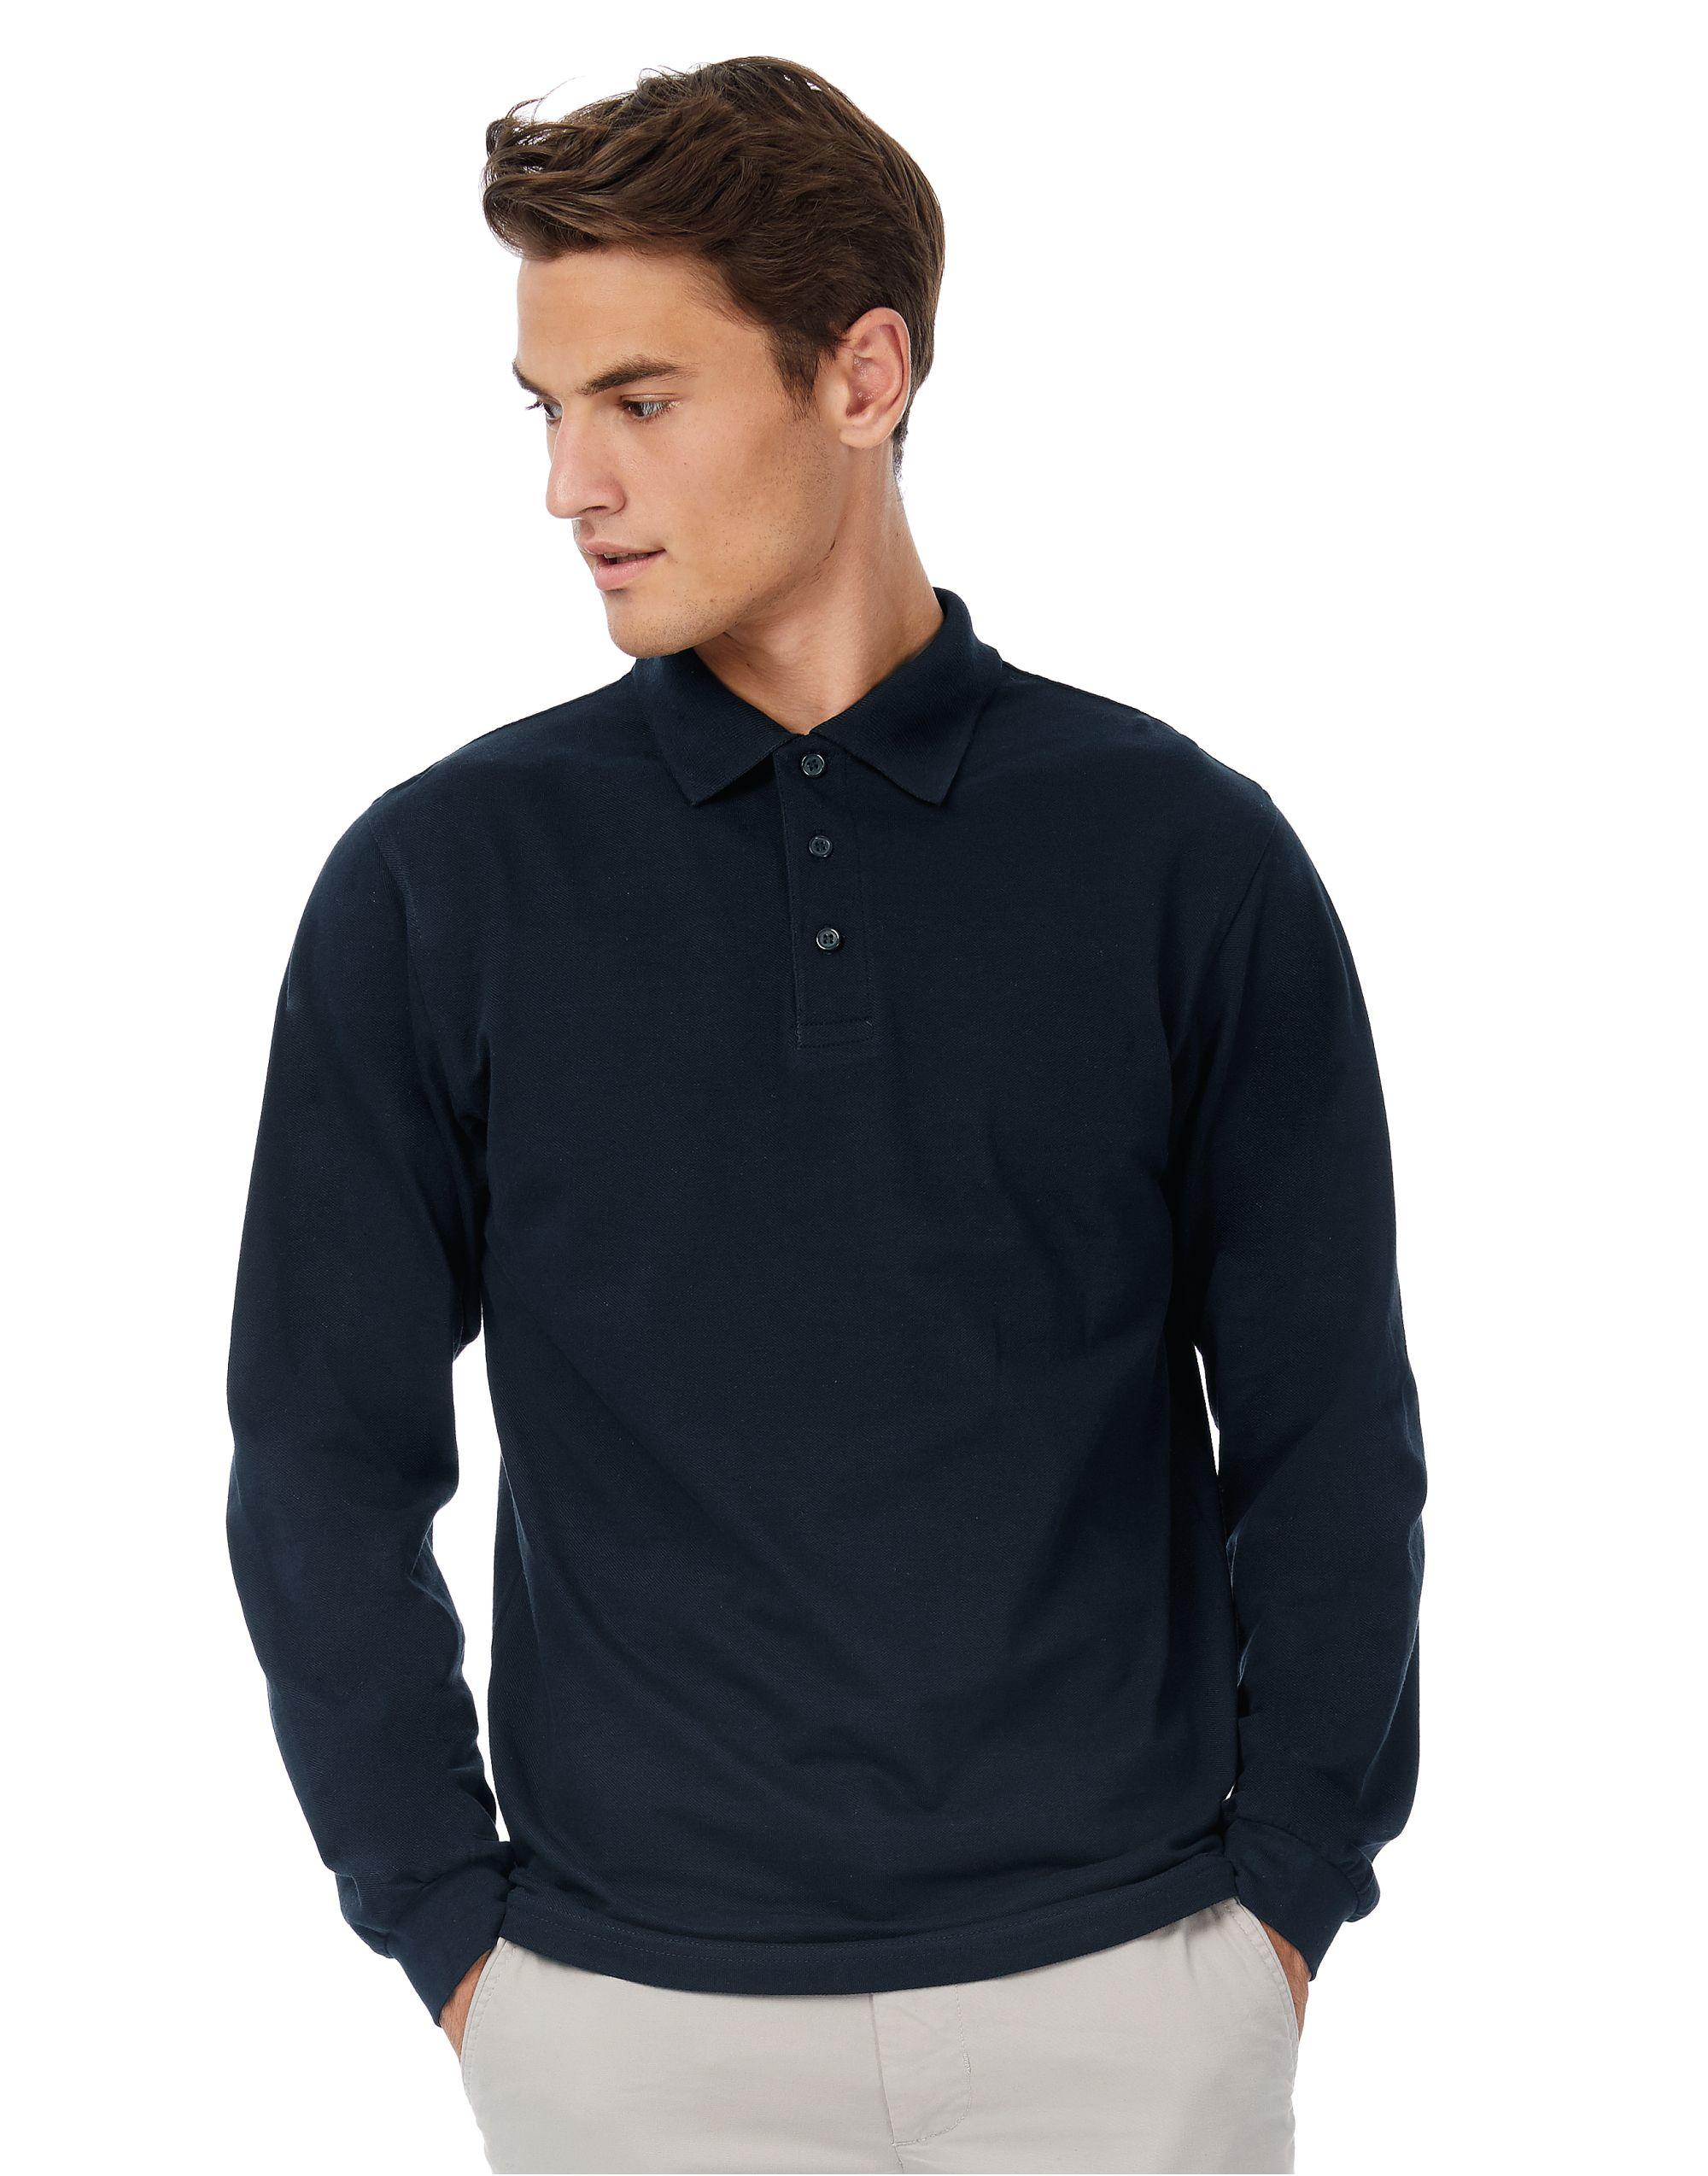 B&C Safran Long-sleeved Polo Shirt